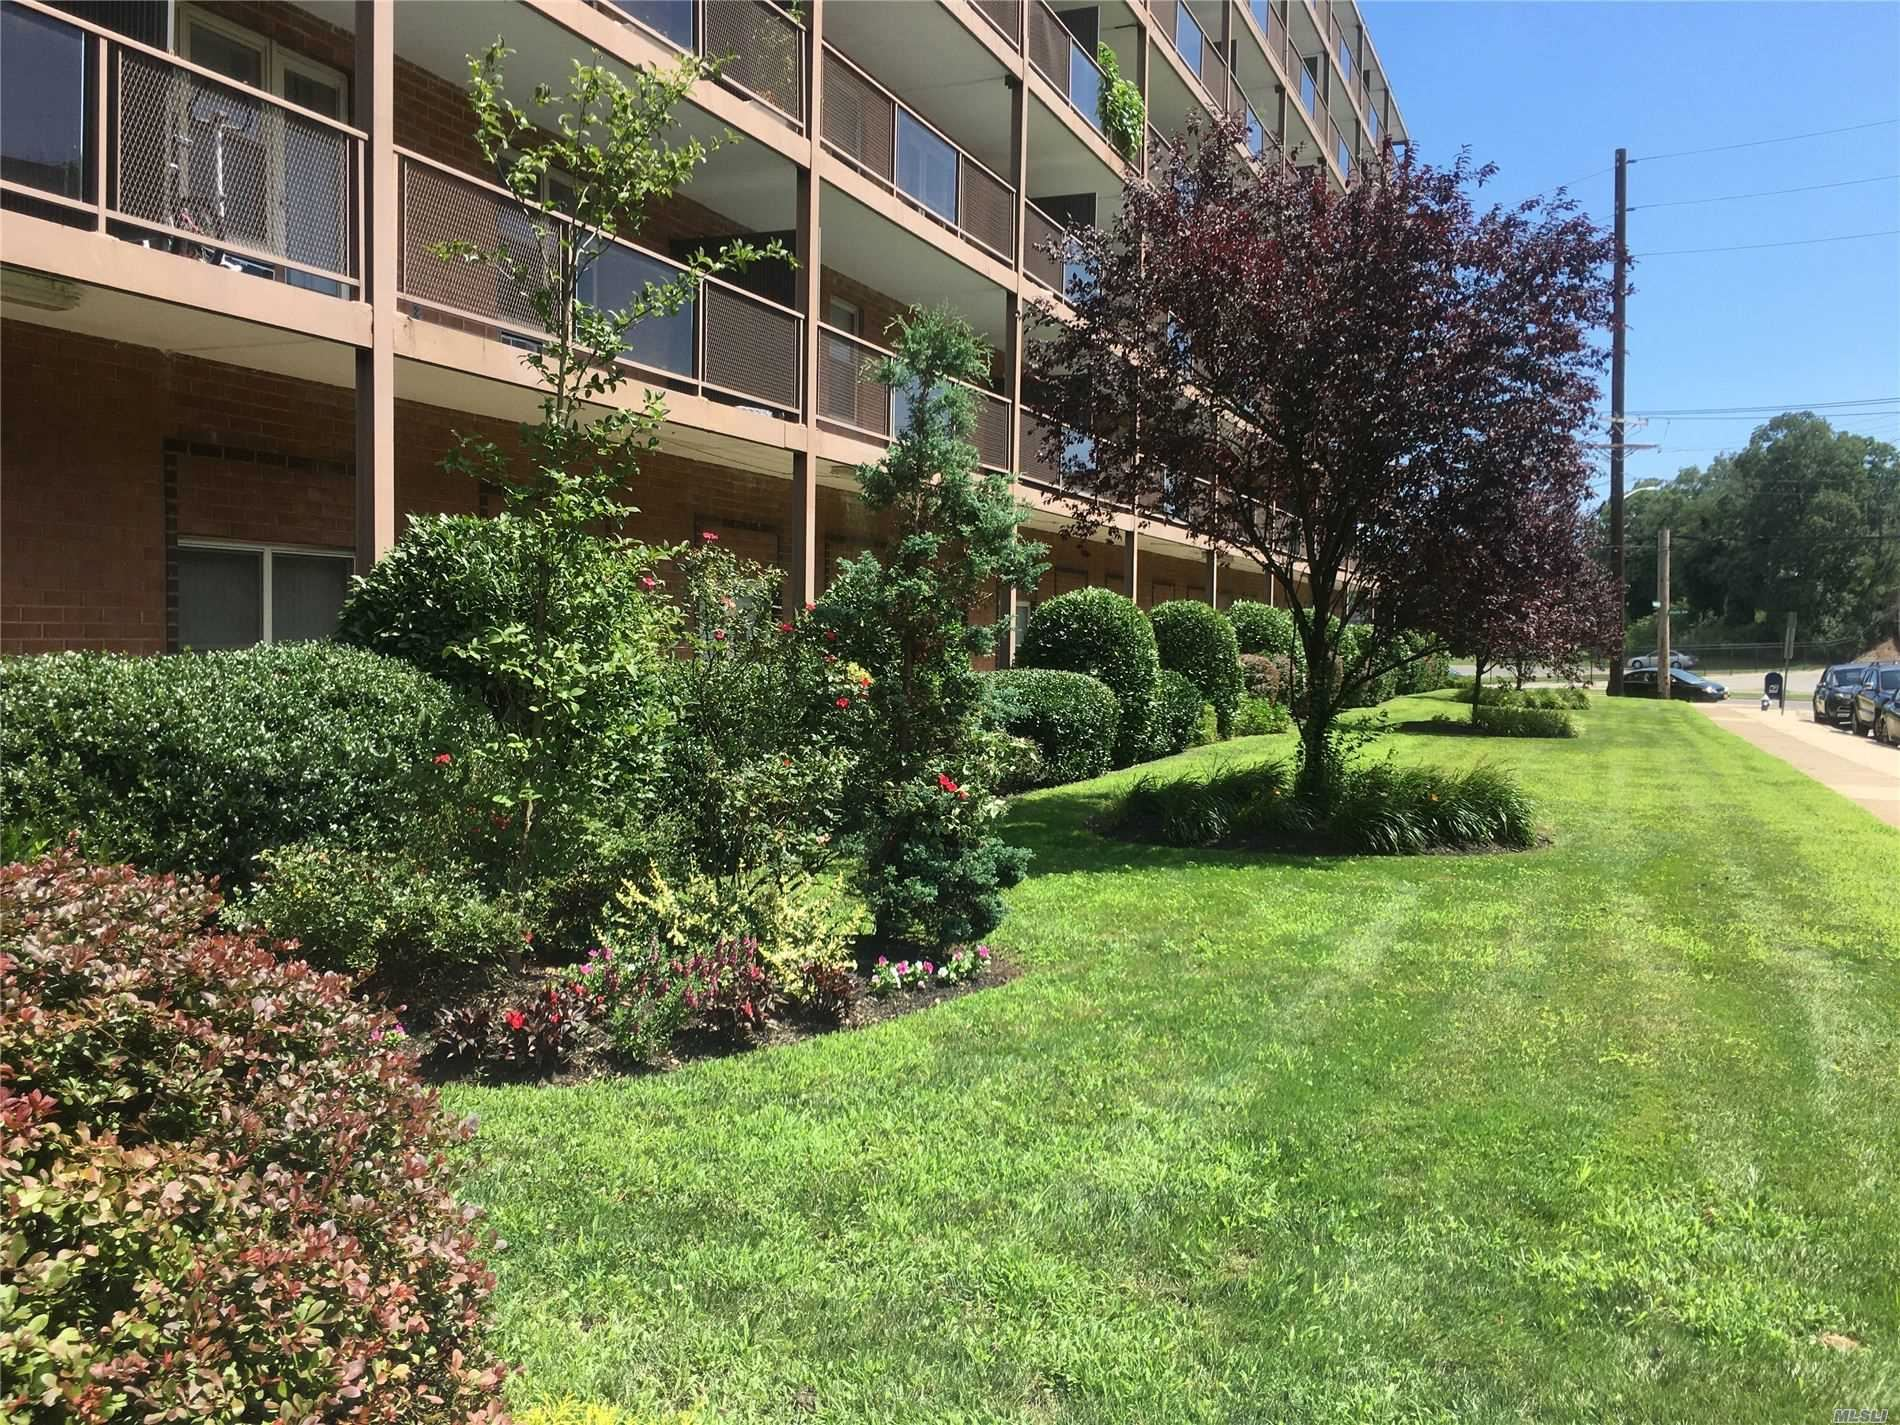 20 Wendell St., Hempstead, NY 11550 - MLS#: 3244719